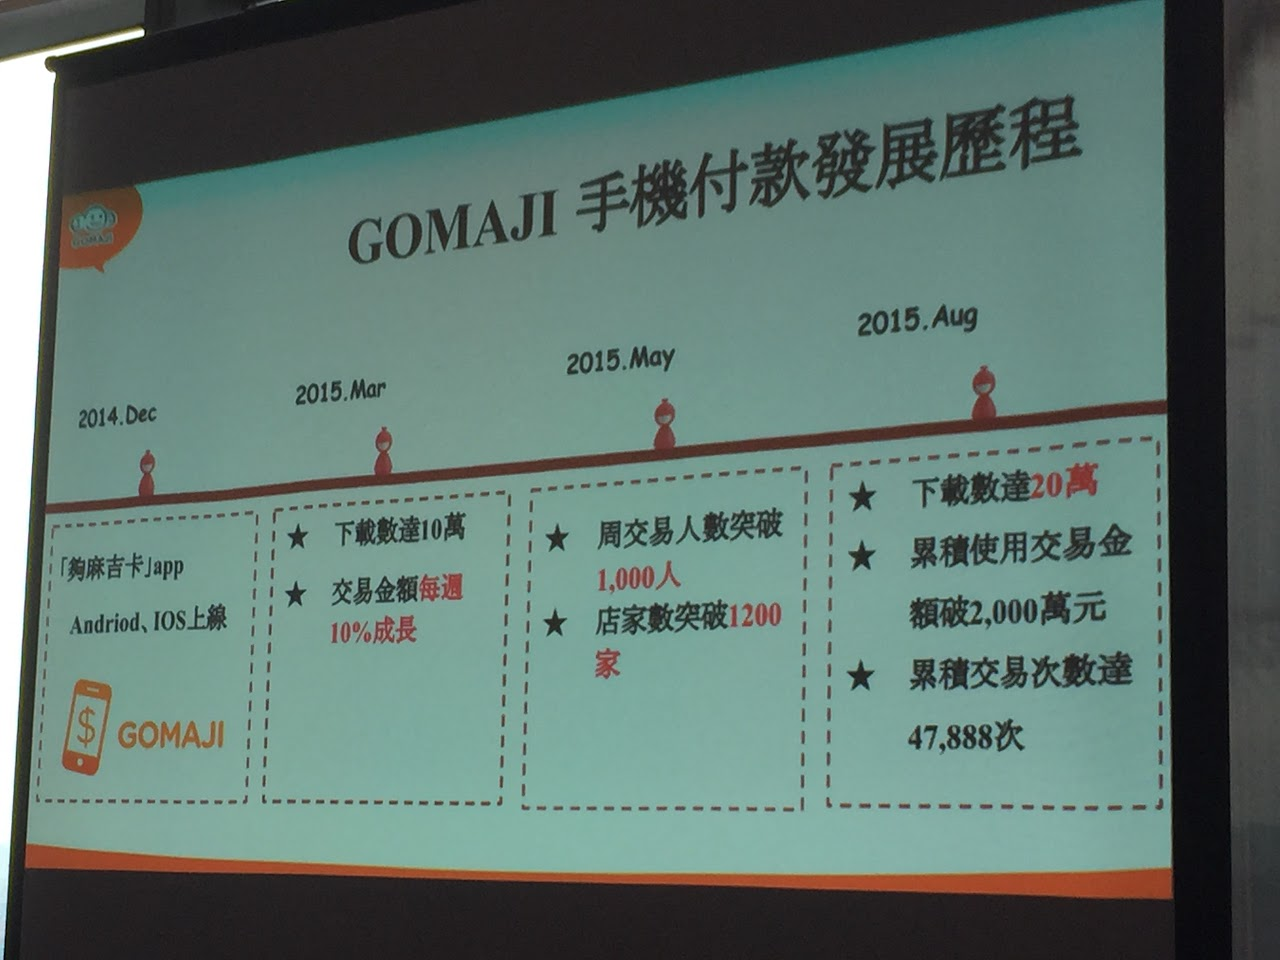 GOMAJI新定位:O2O服務,目標3年內改以行動支付為主要營收